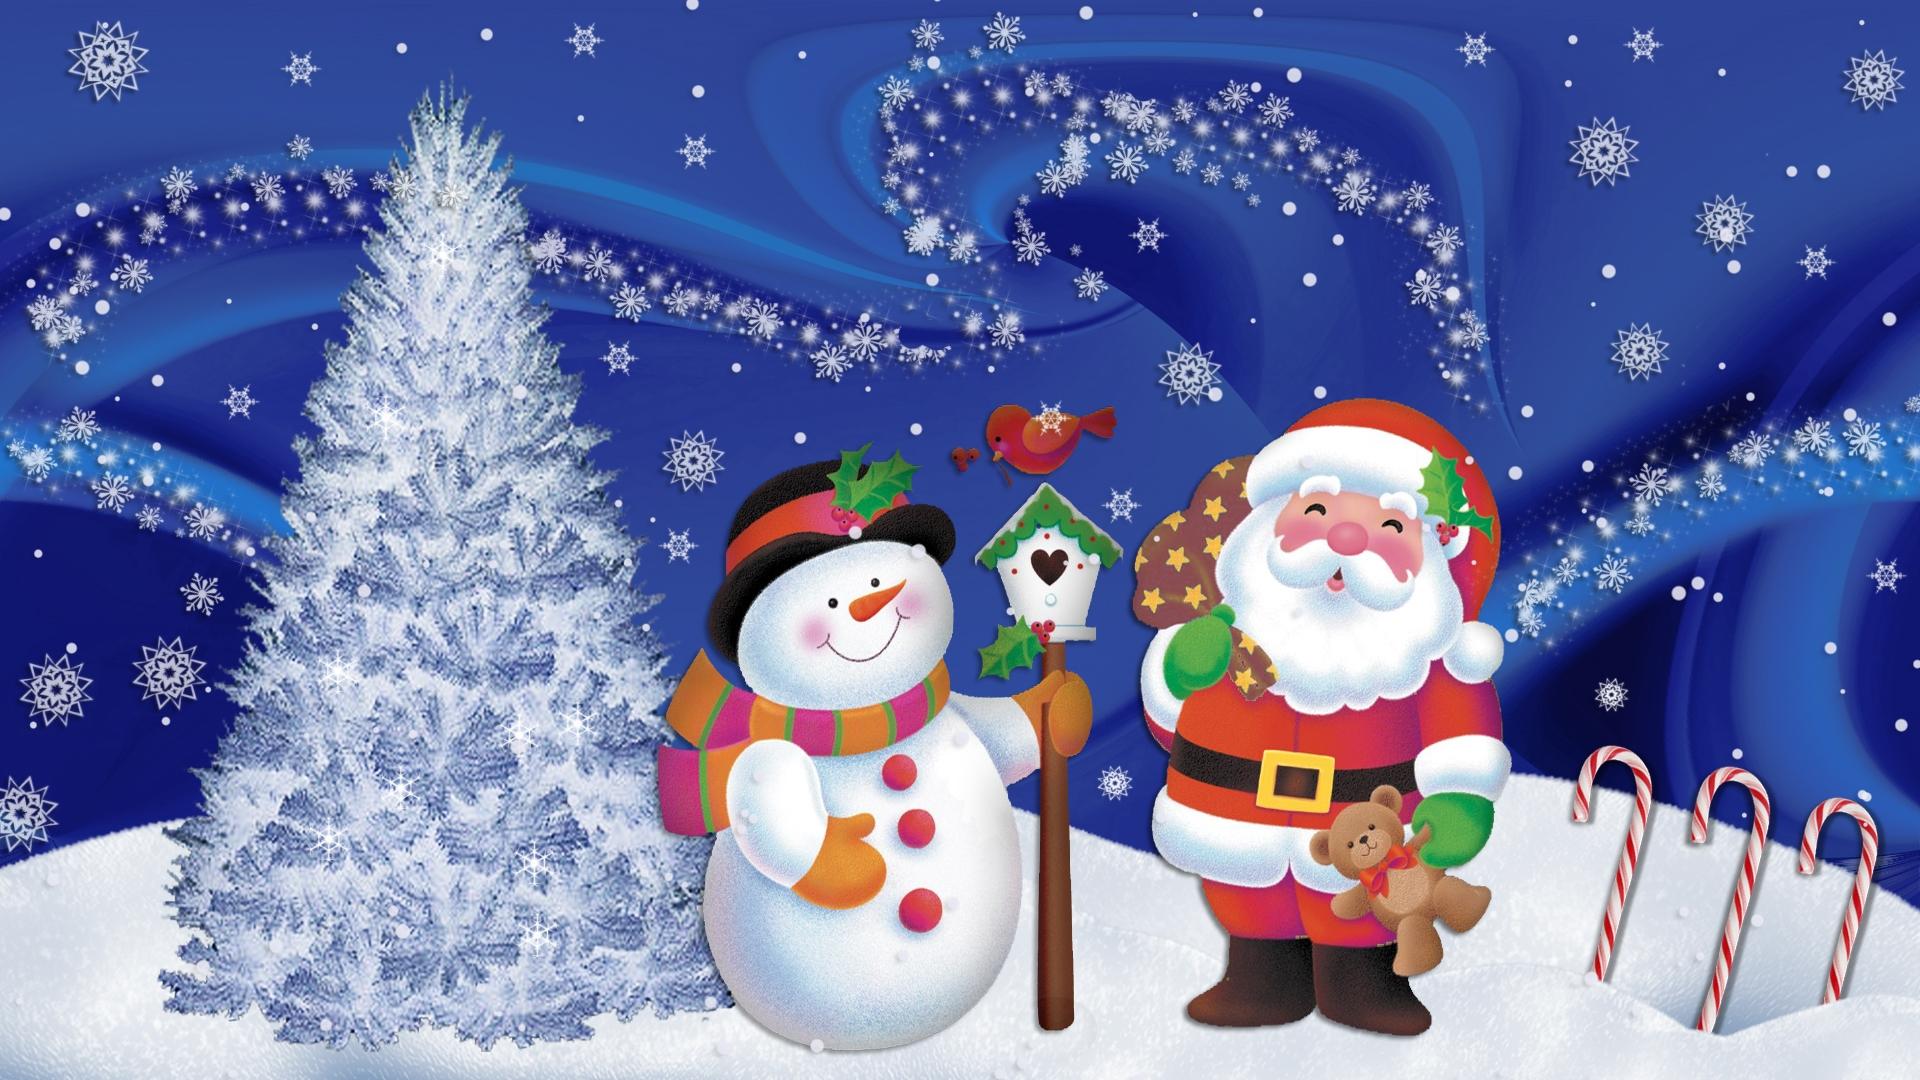 Christmas Reindeer Santa Claus Wooden House Vector Snow